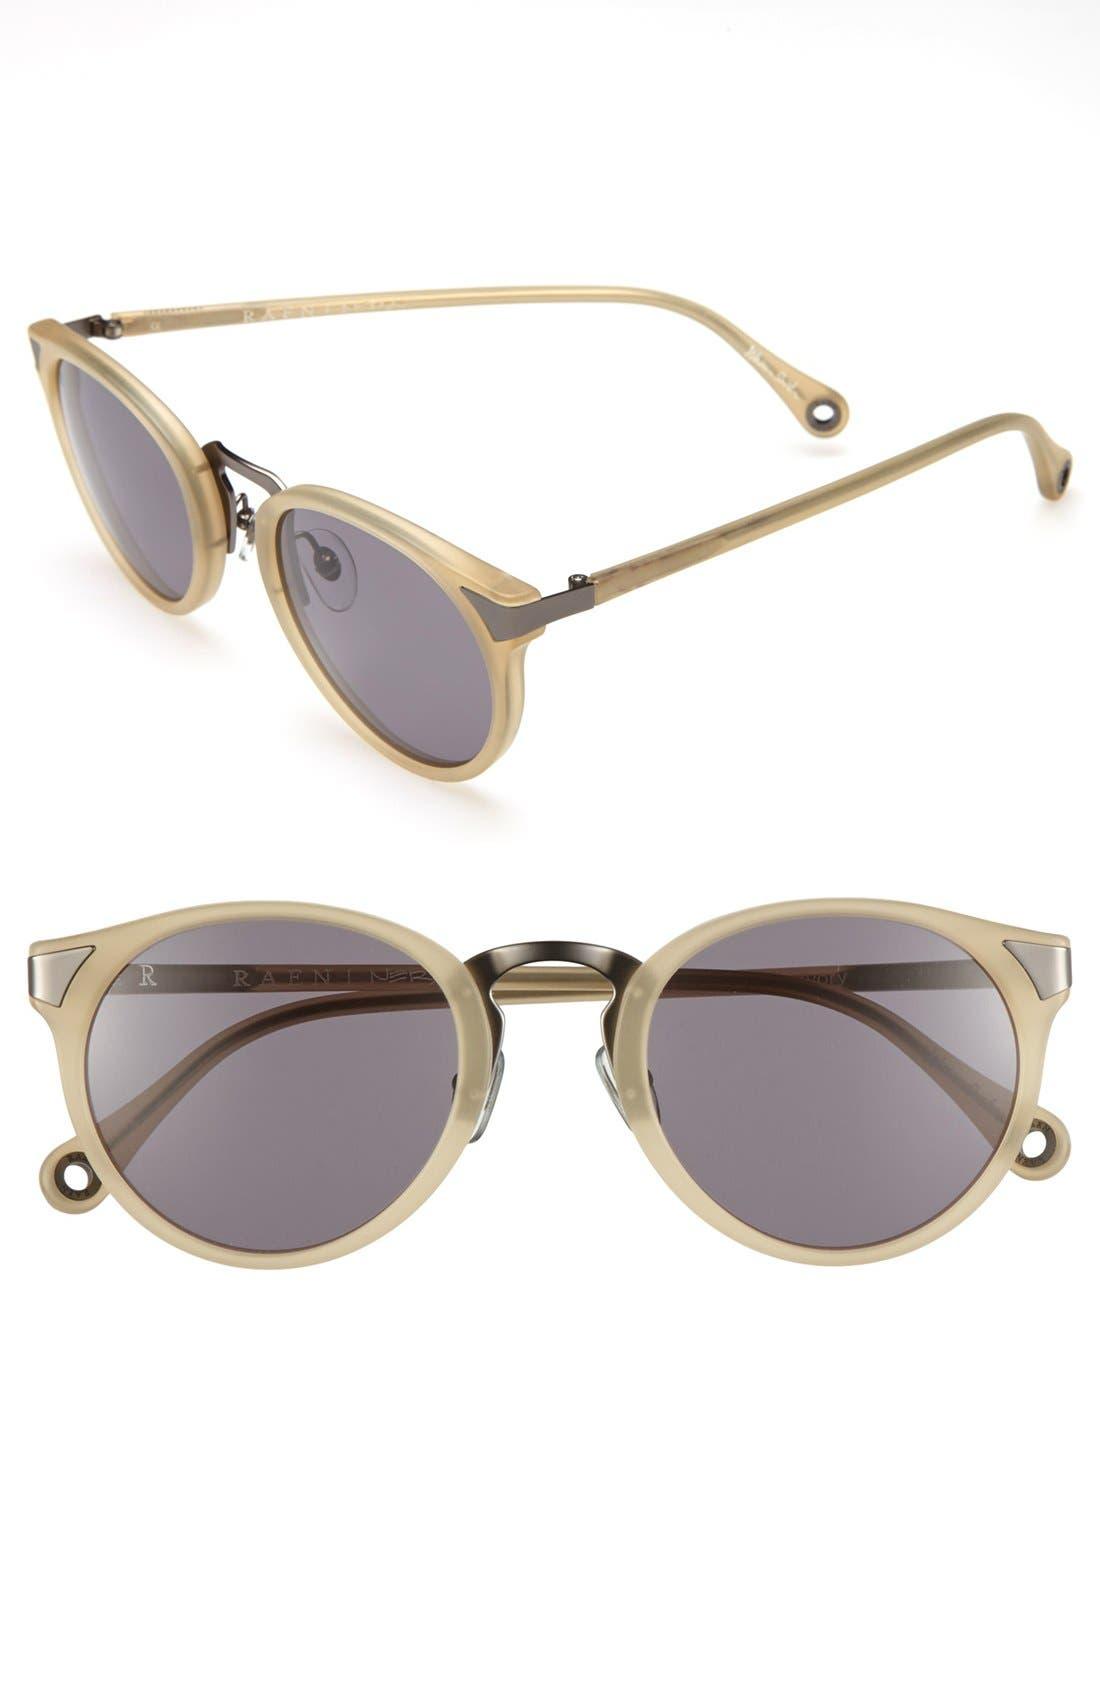 Main Image - RAEN 'Nera' 50mm Sunglasses (Online Exclusive)